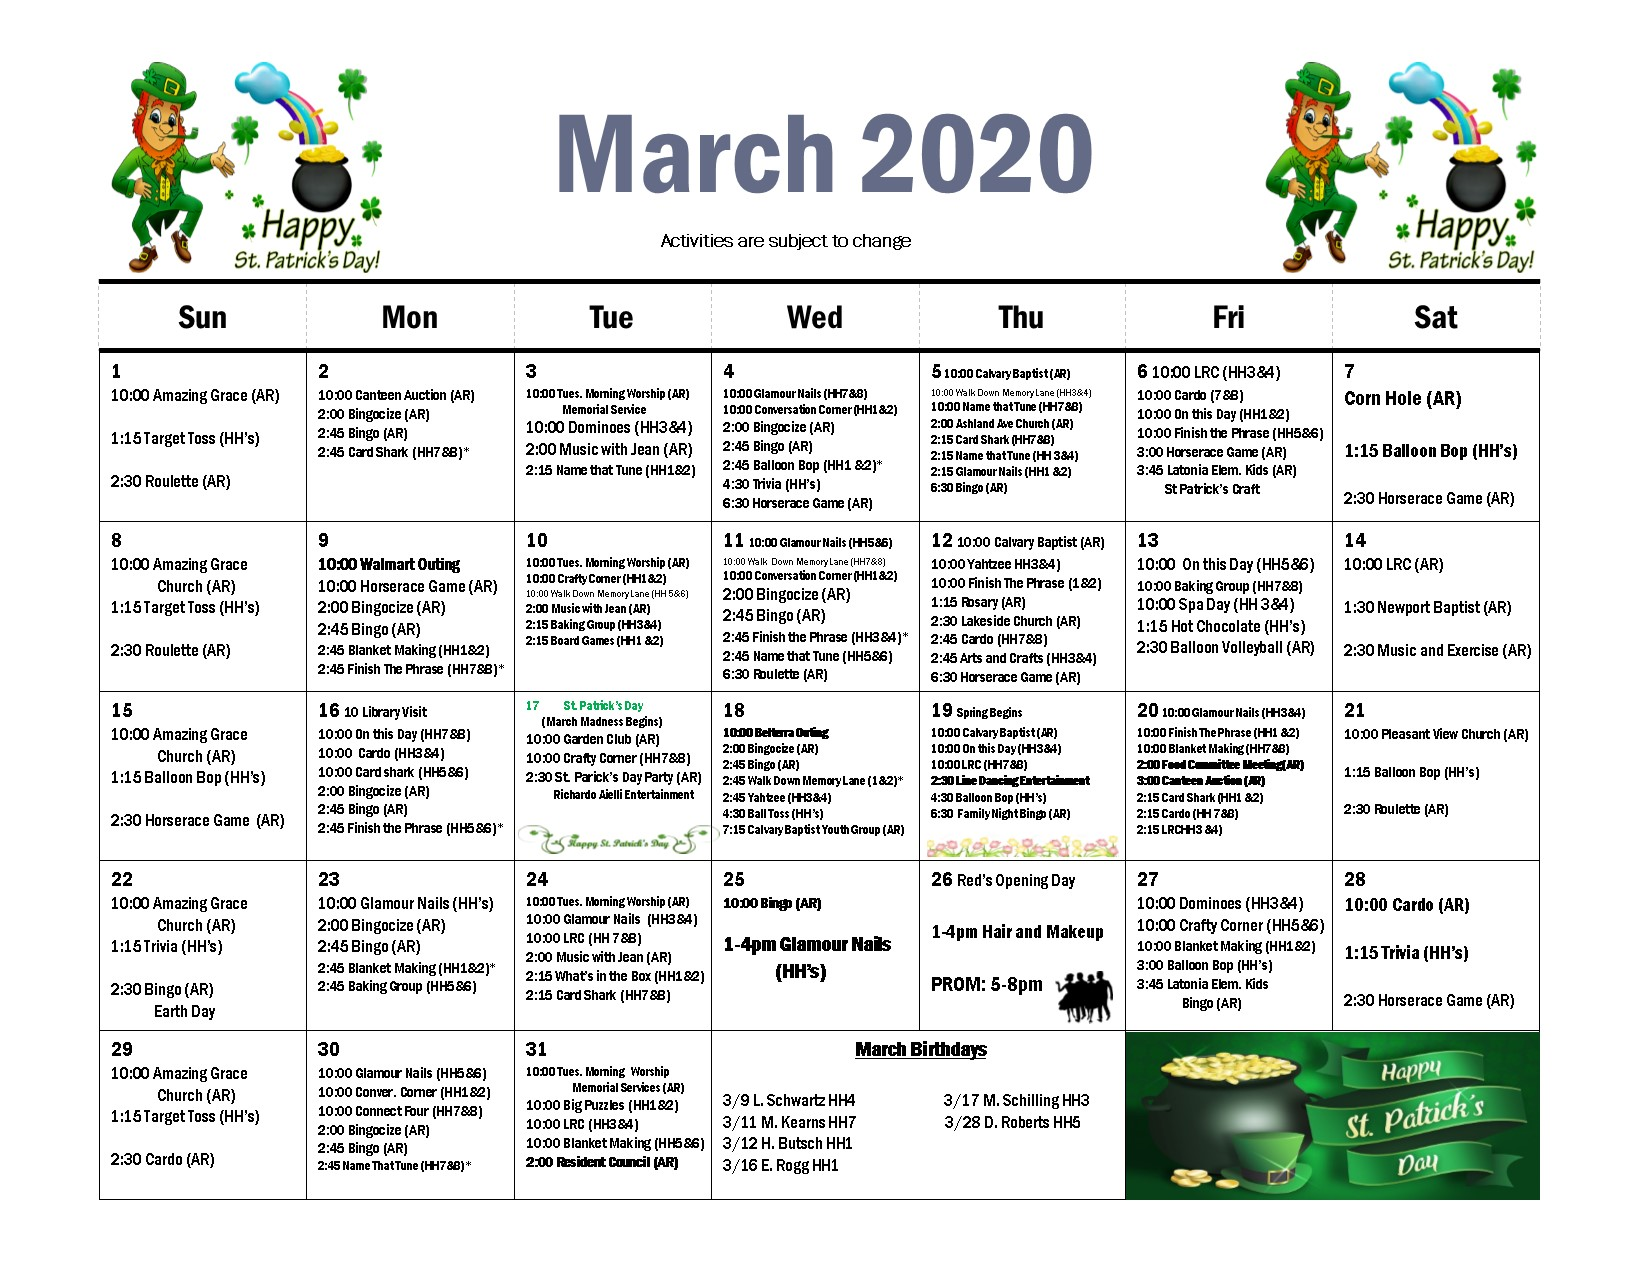 rosedale March 2020